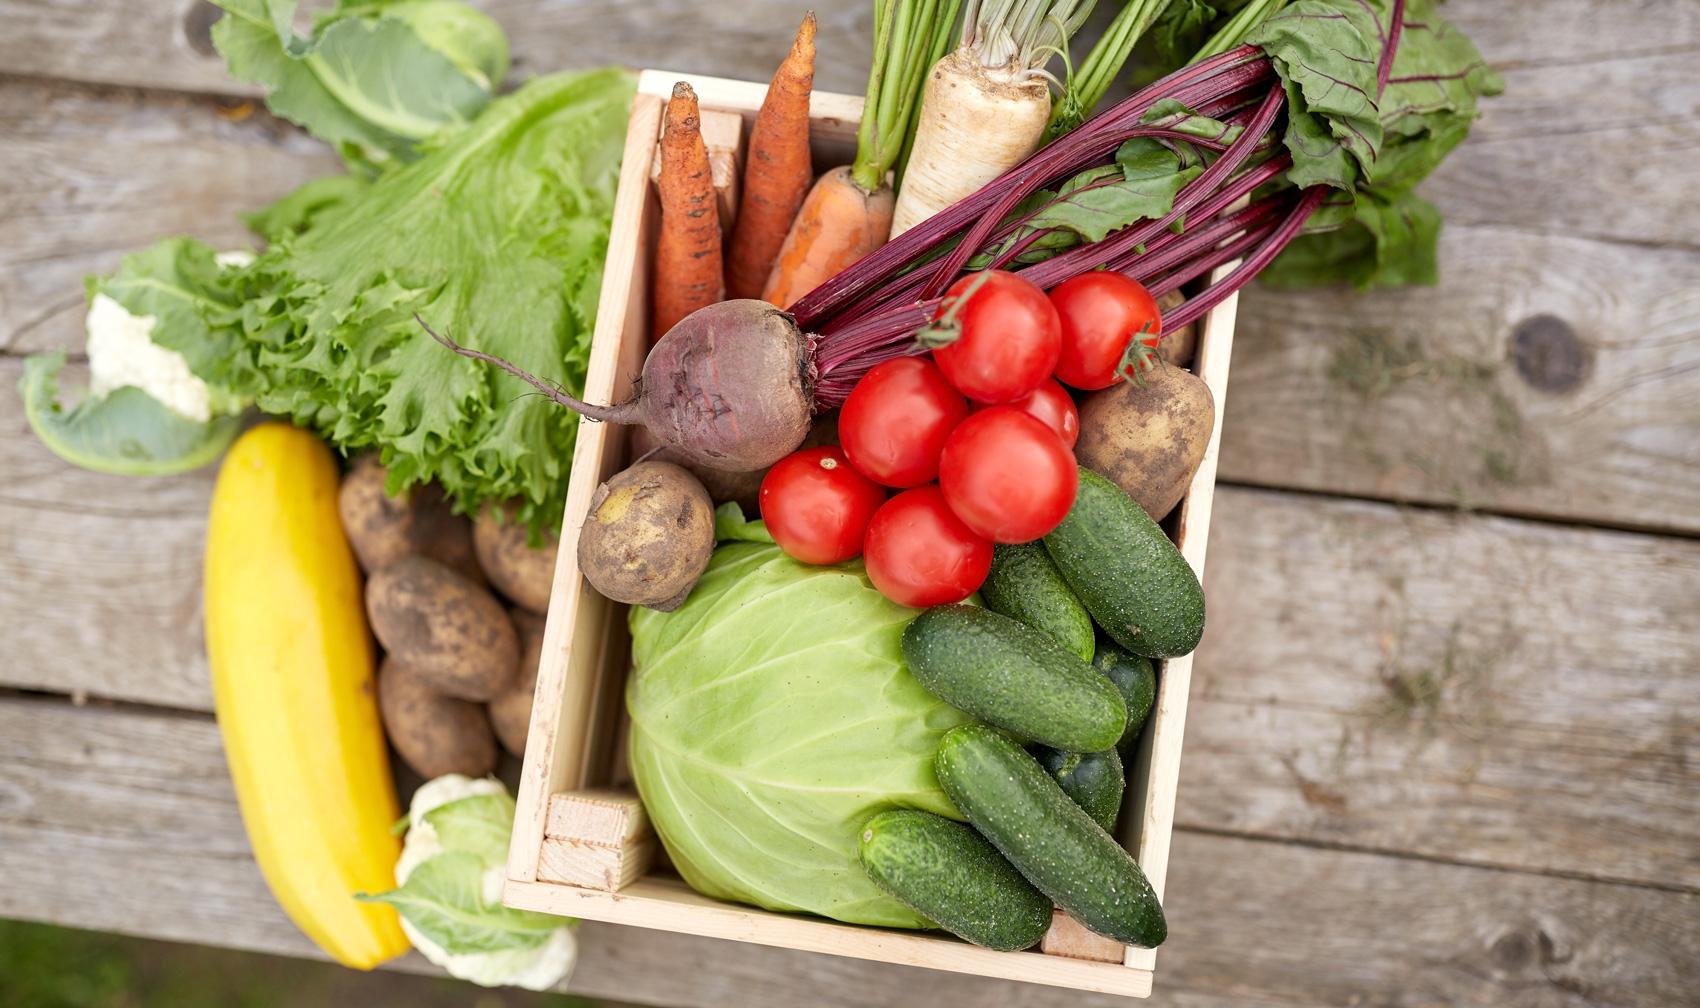 Carolina Farm Trust Filling Gaps In The Local Food Movement Through Carolina Jubilee Music Festival